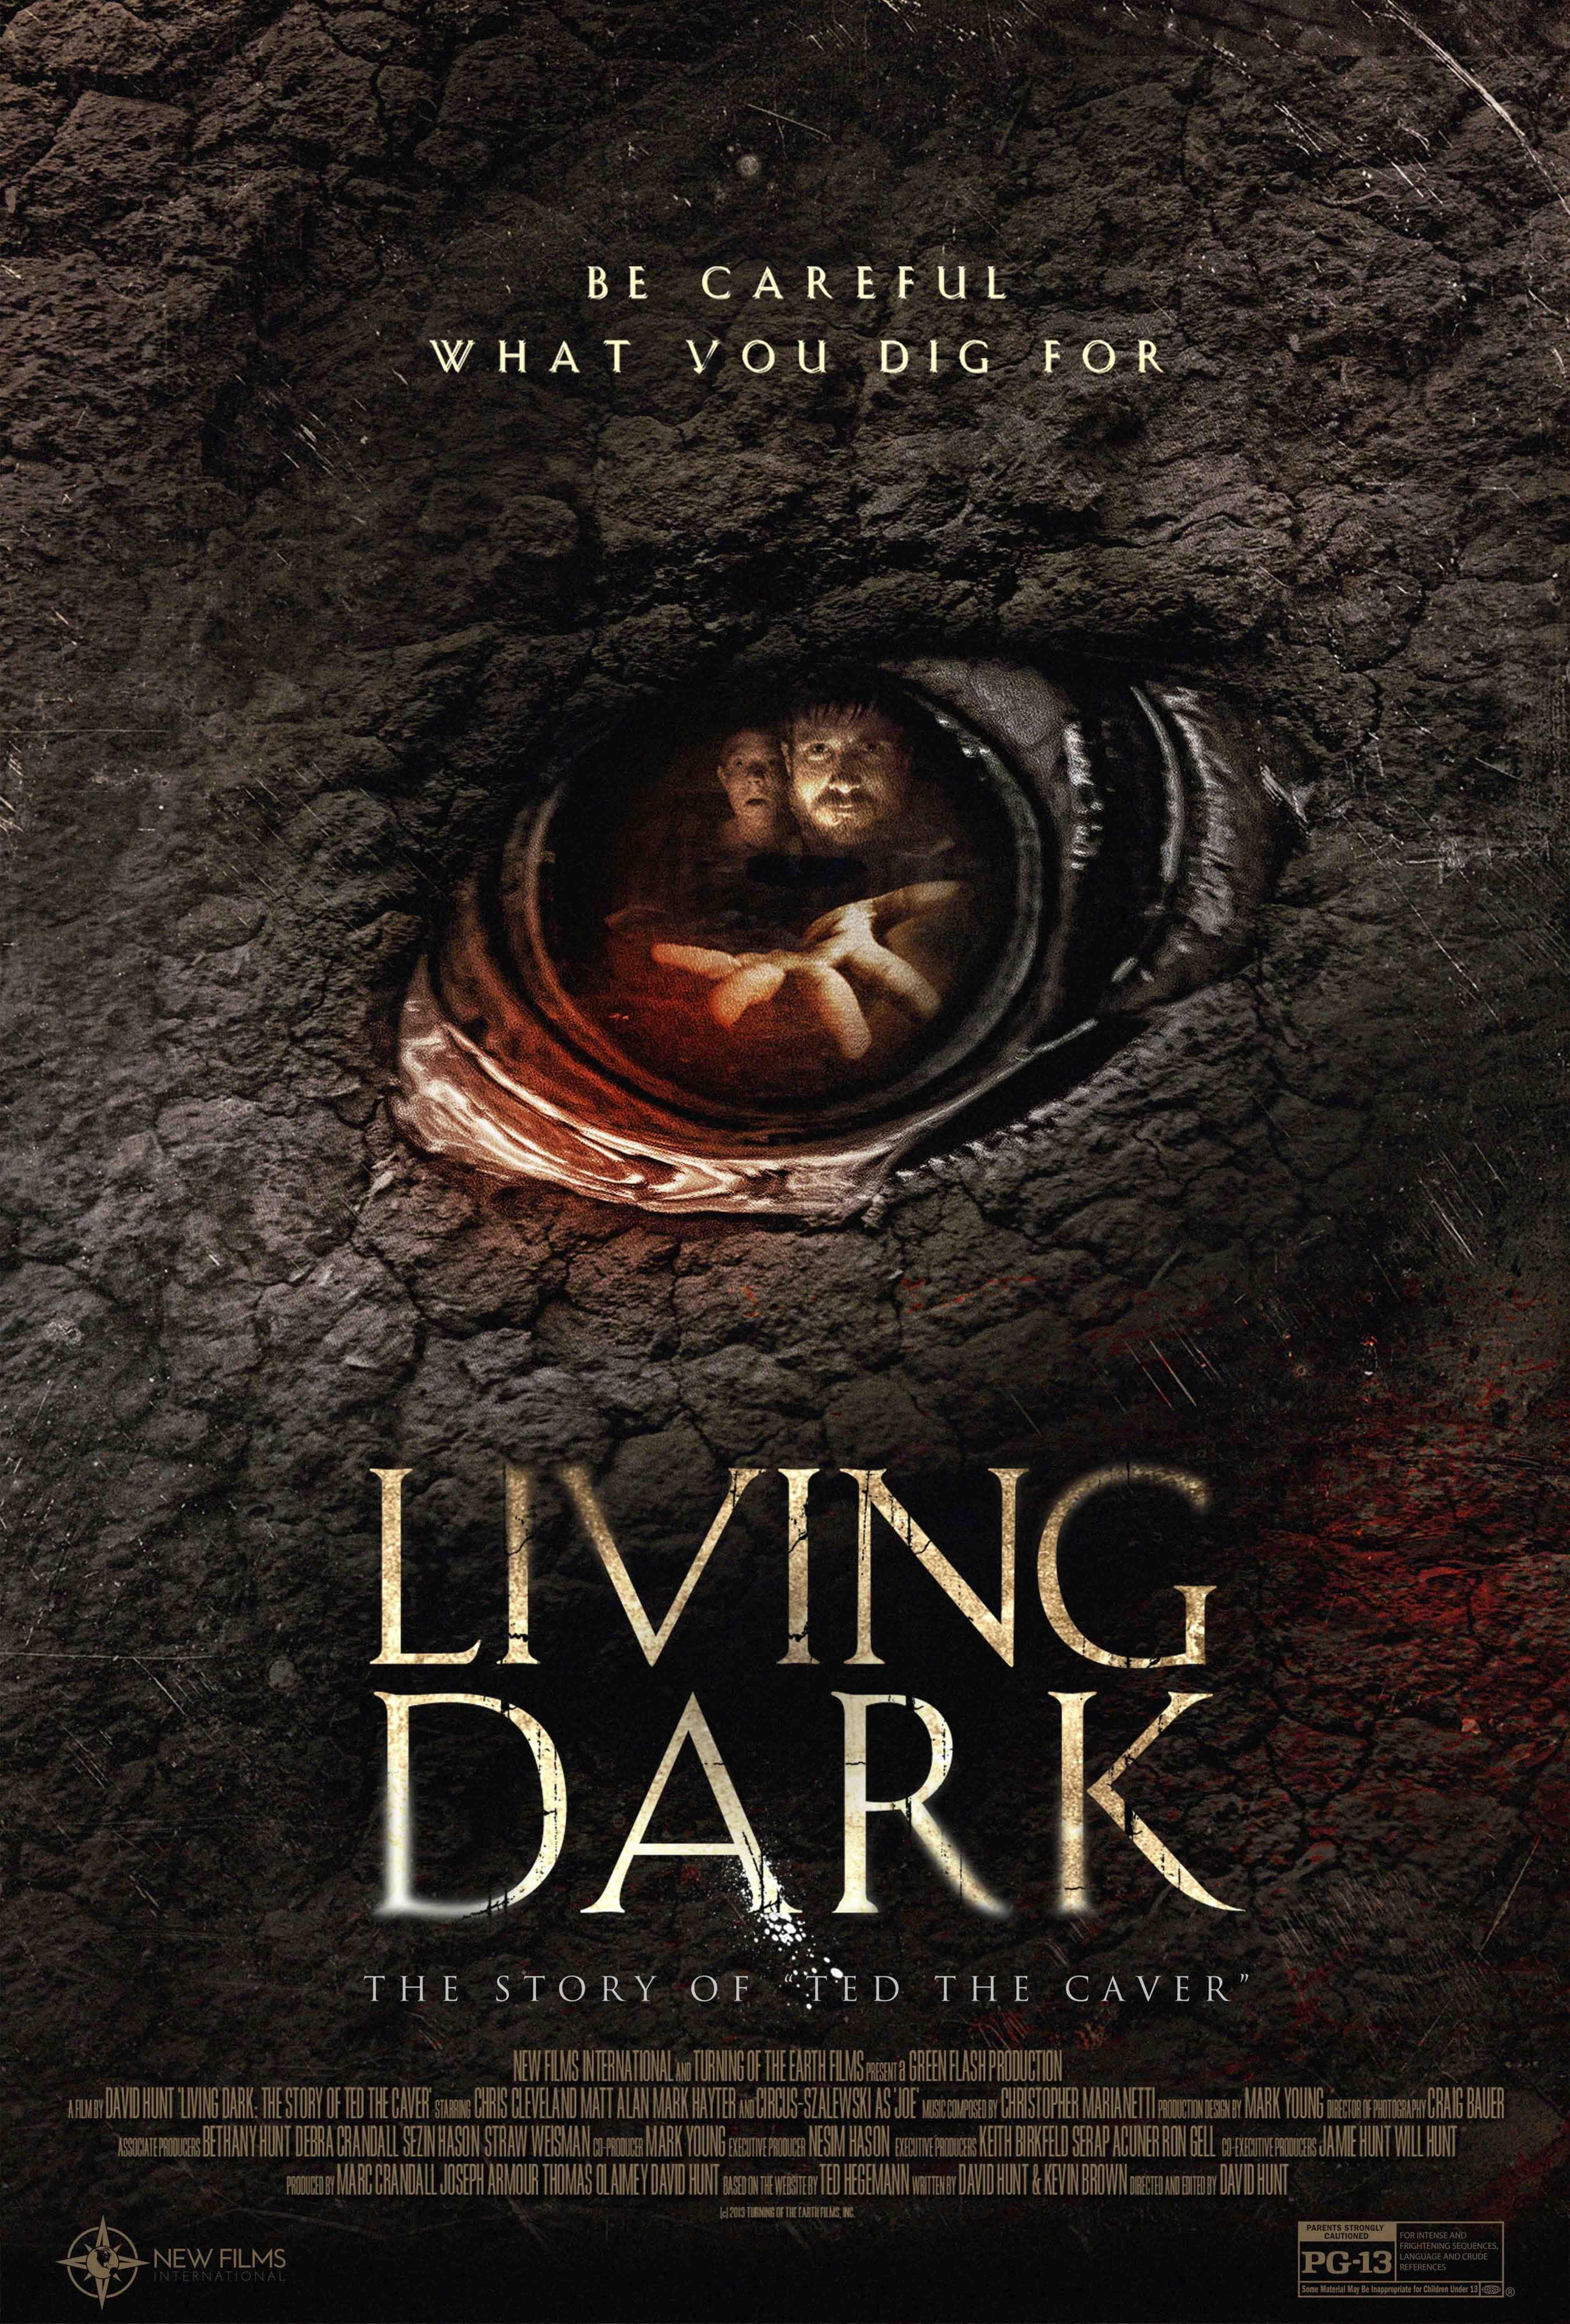 Żywa ciemność: histora Teda Grotołaza / Living Dark: The Story of Ted the Caver